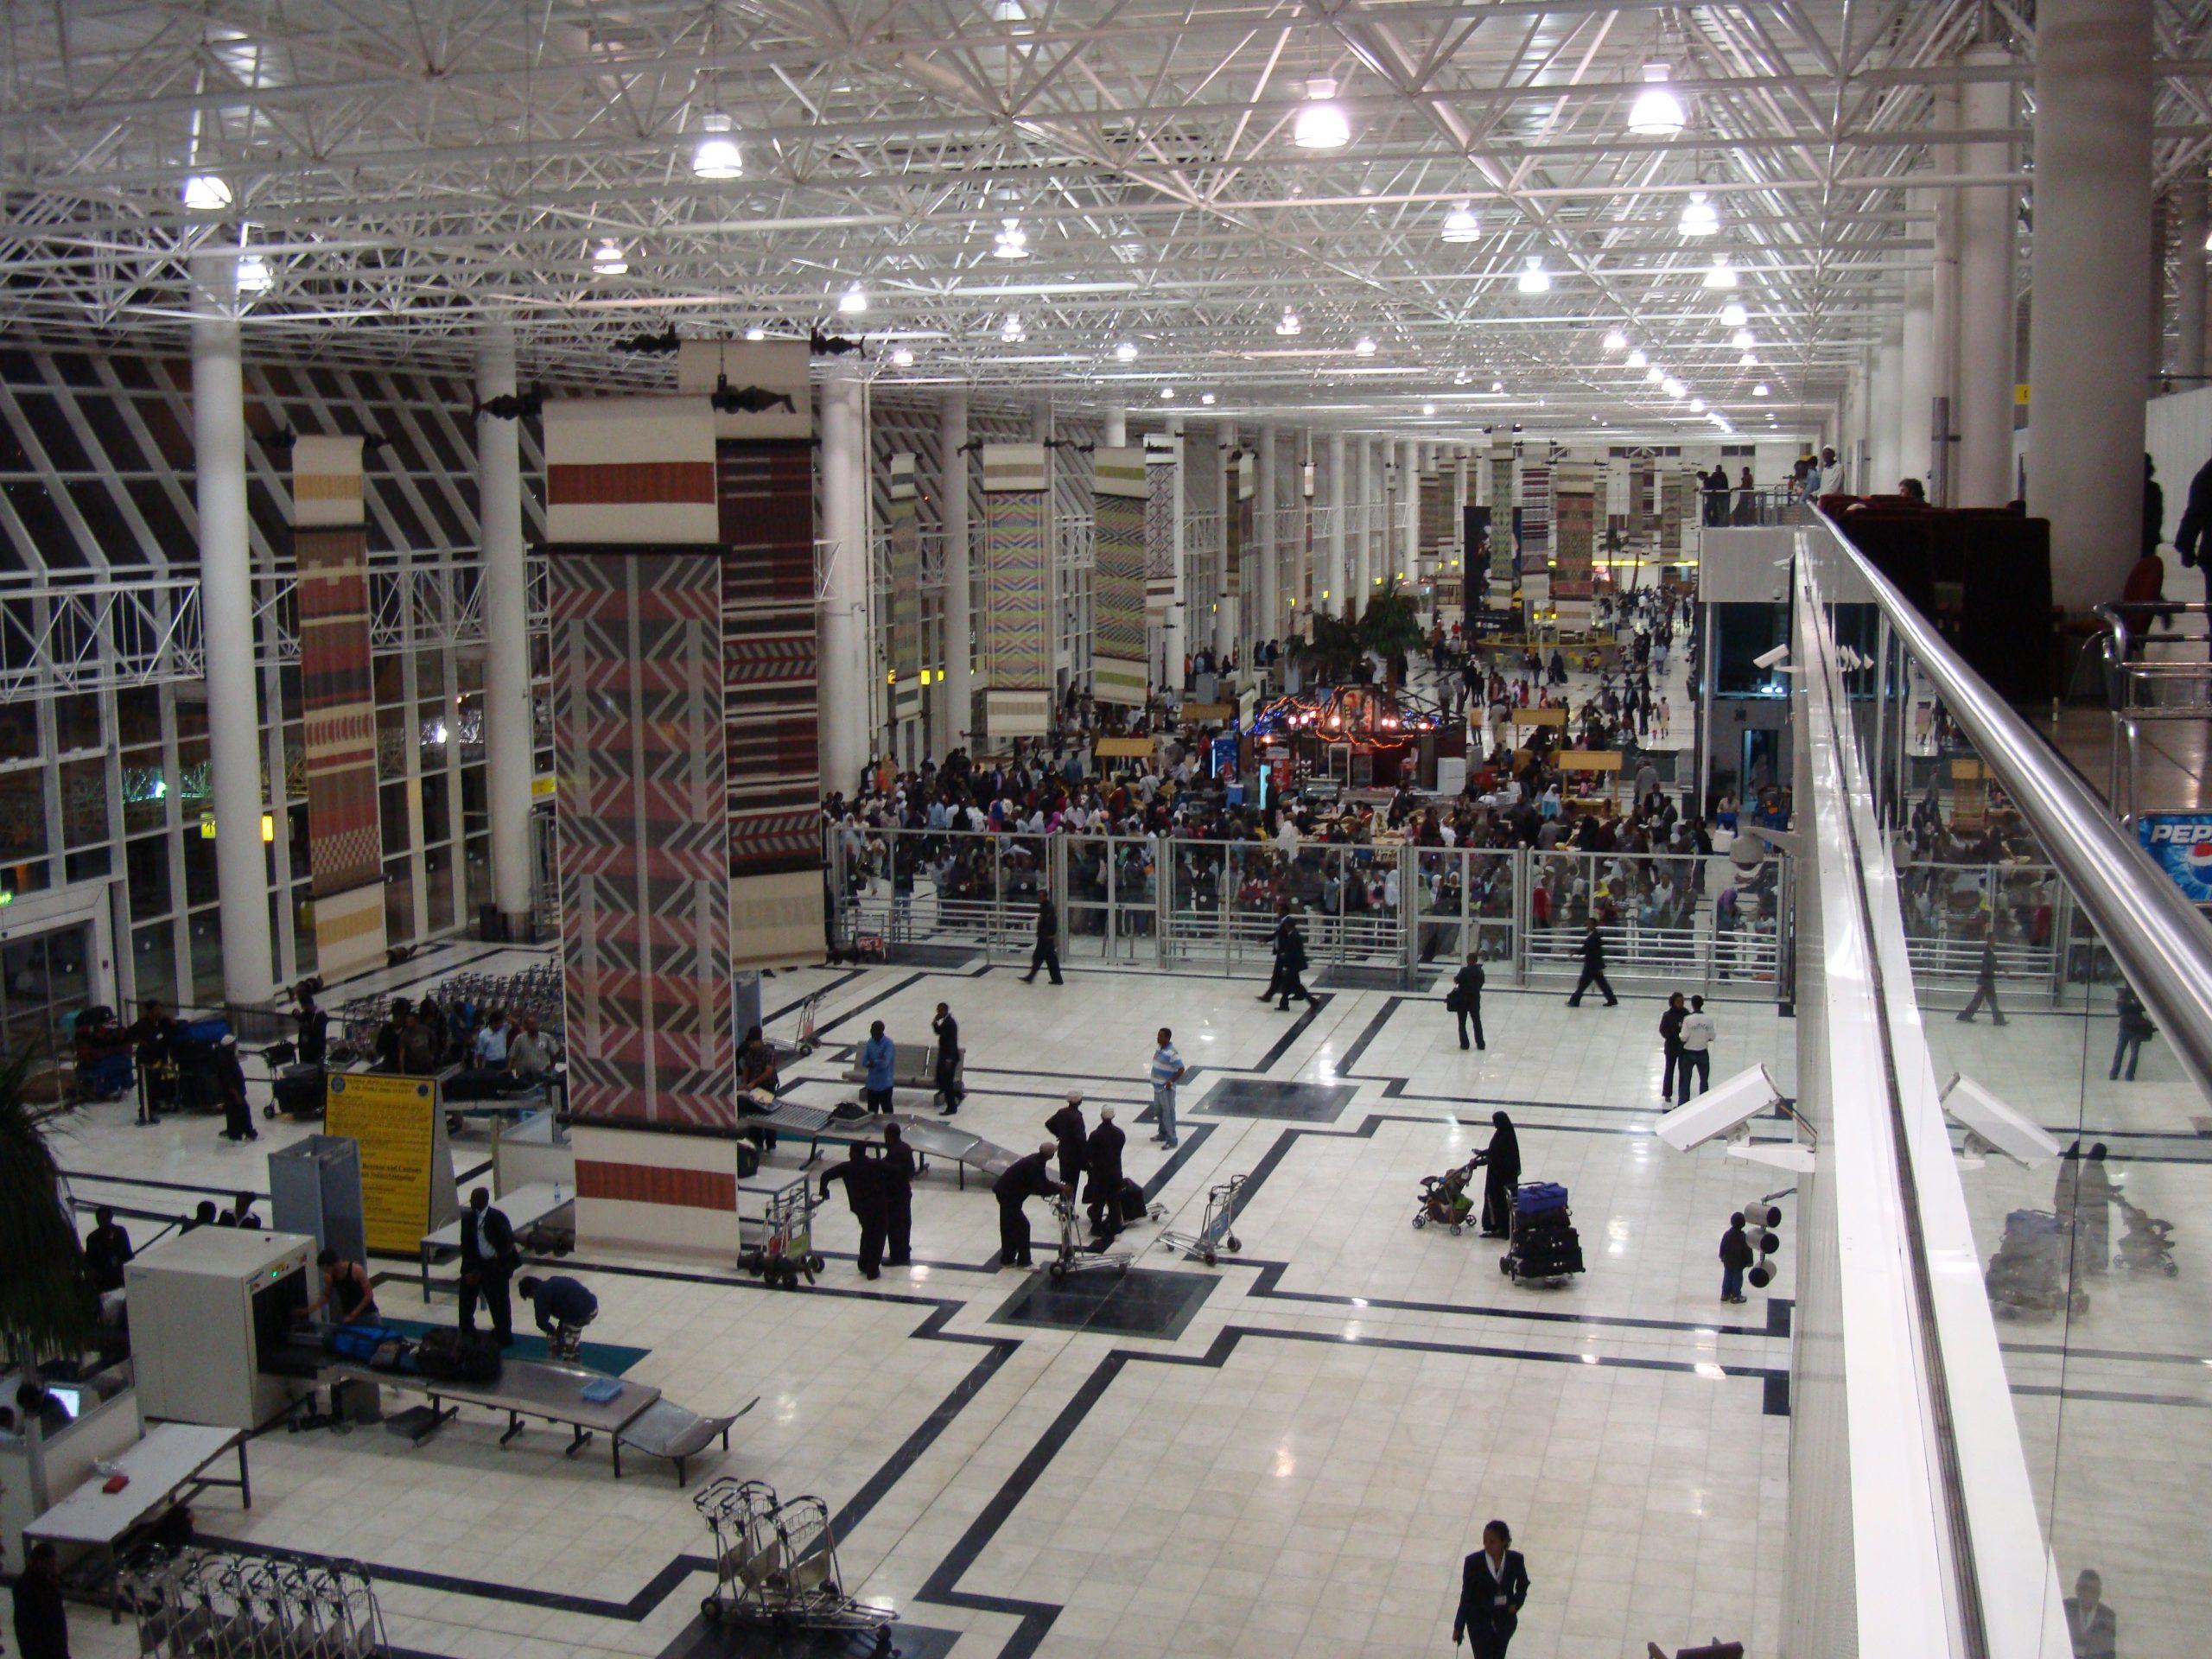 Ethiopian Airlines vil erstatte Bole International Airport (billedet) med en ny storlufthavn. Foto: Vob08, CC 3.0